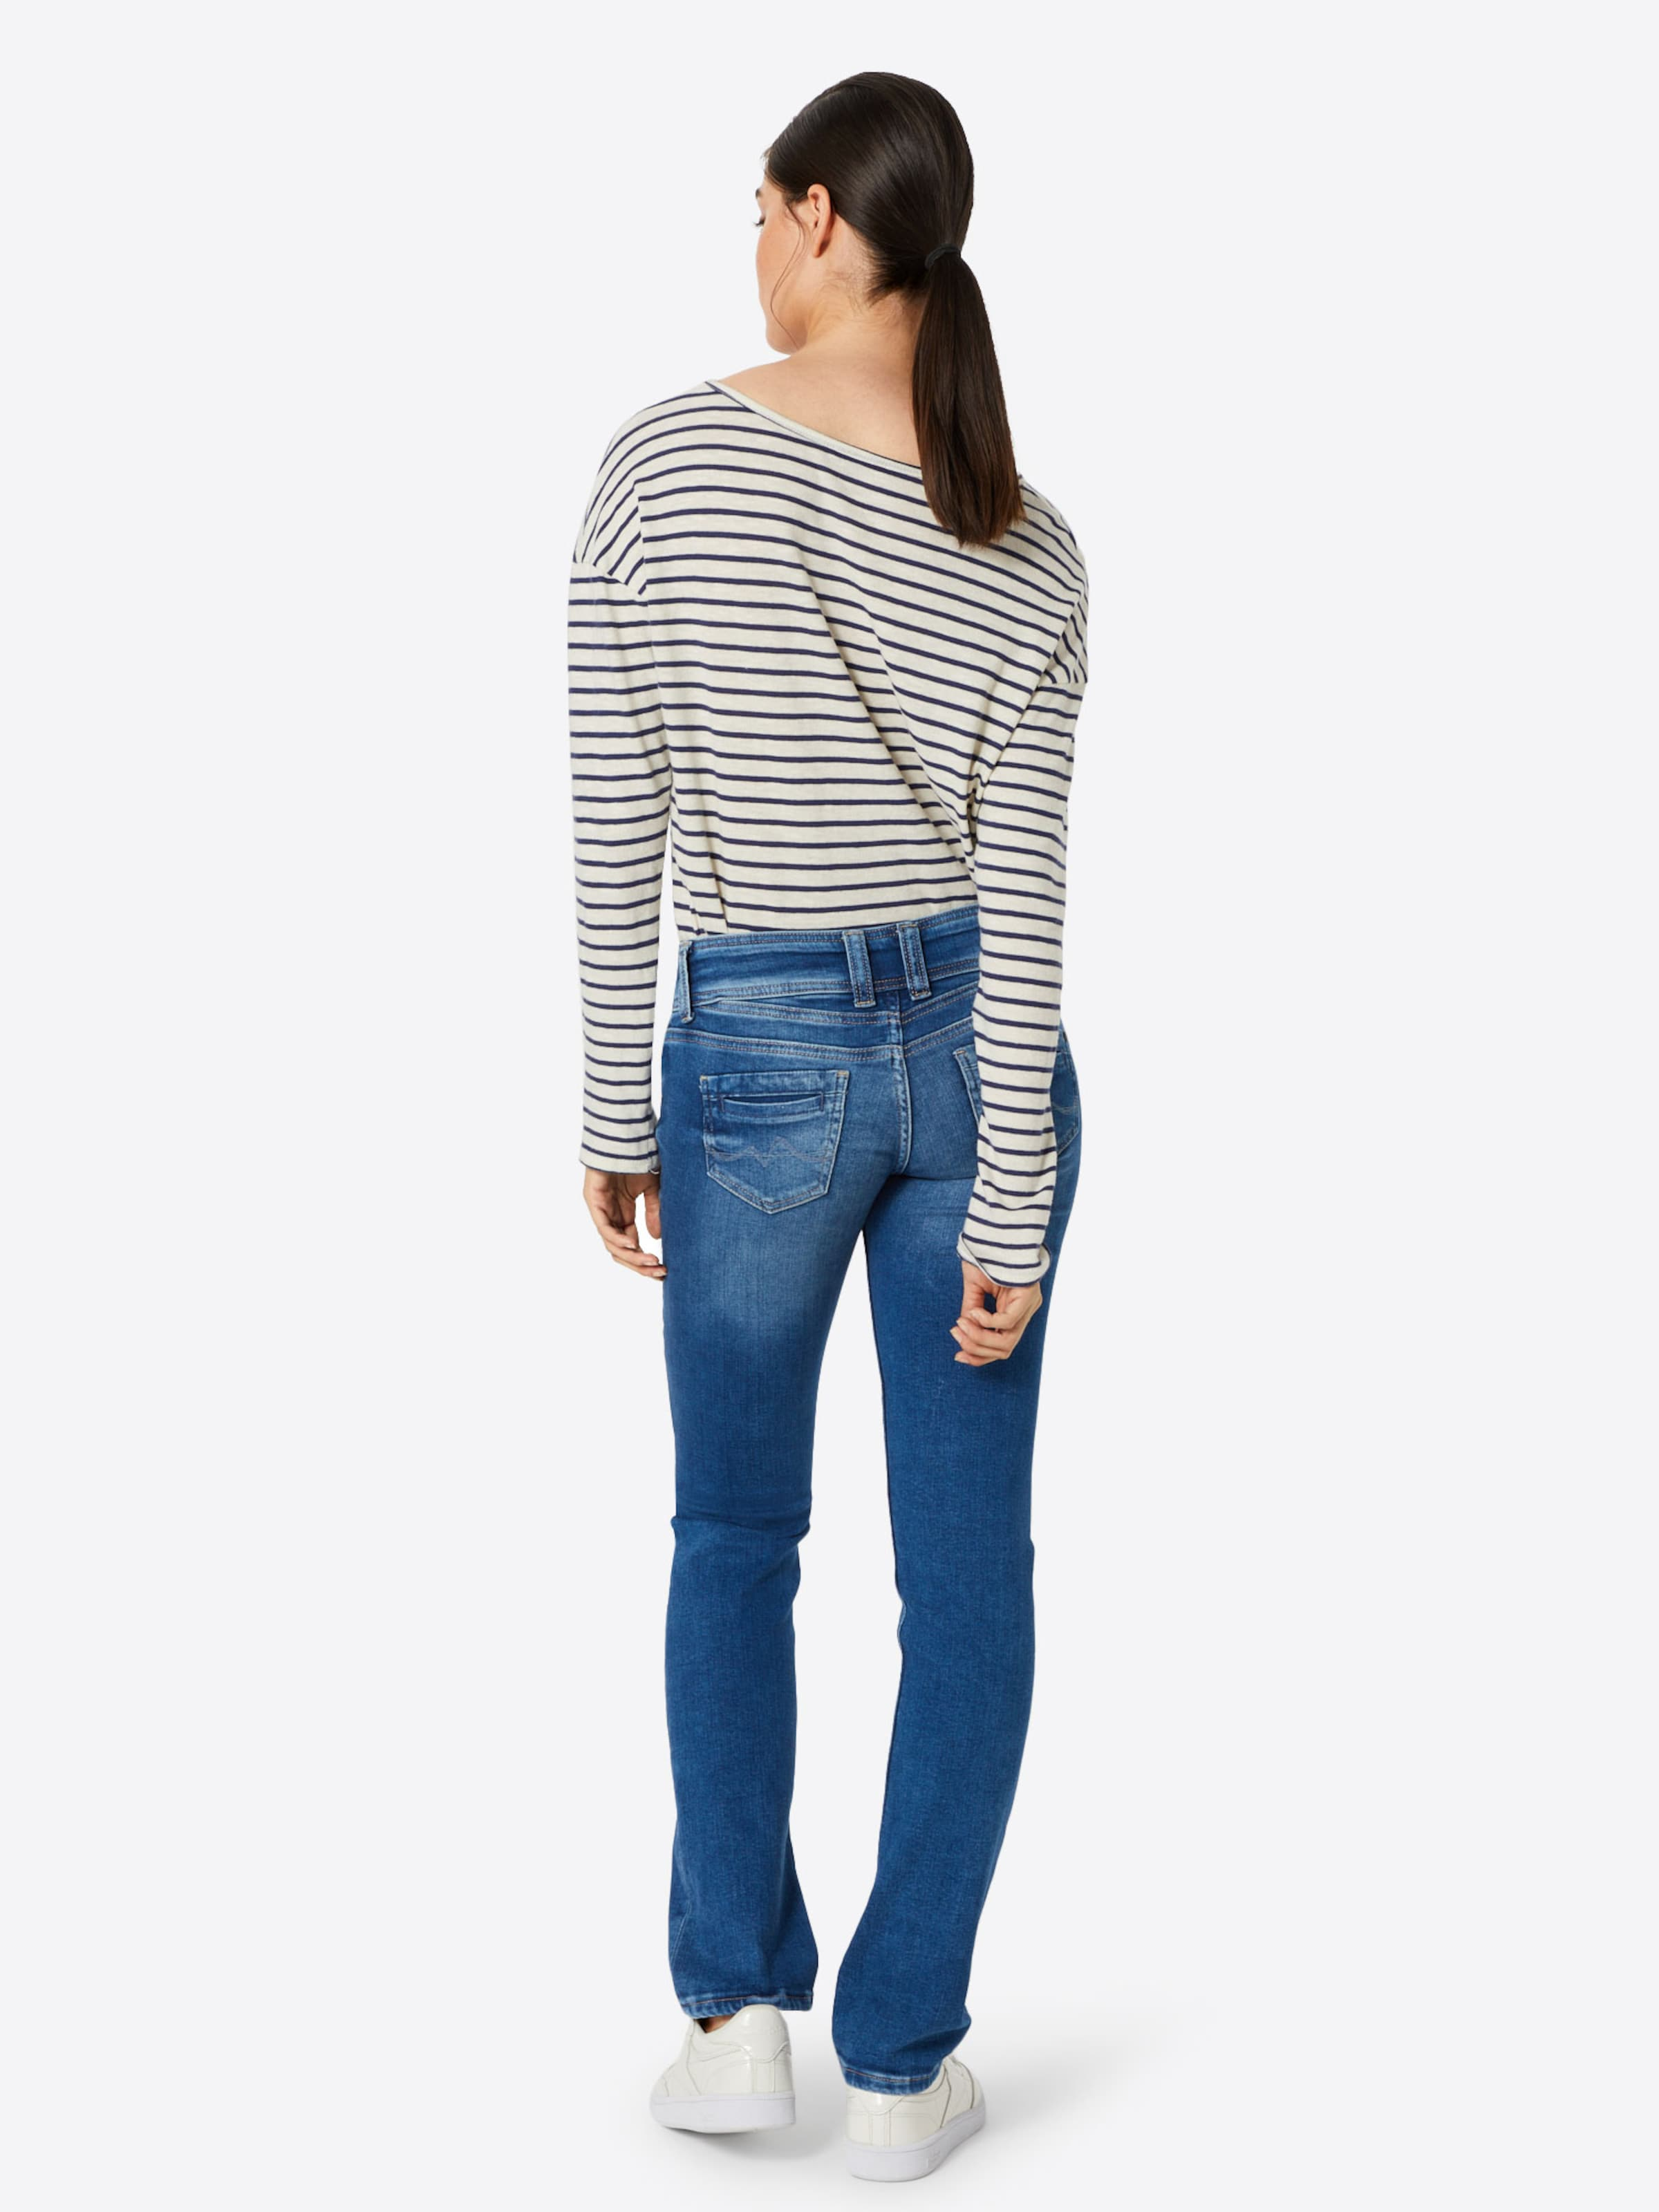 Jeans Blue Denim In Pepe 'gen' v8n0wOmN